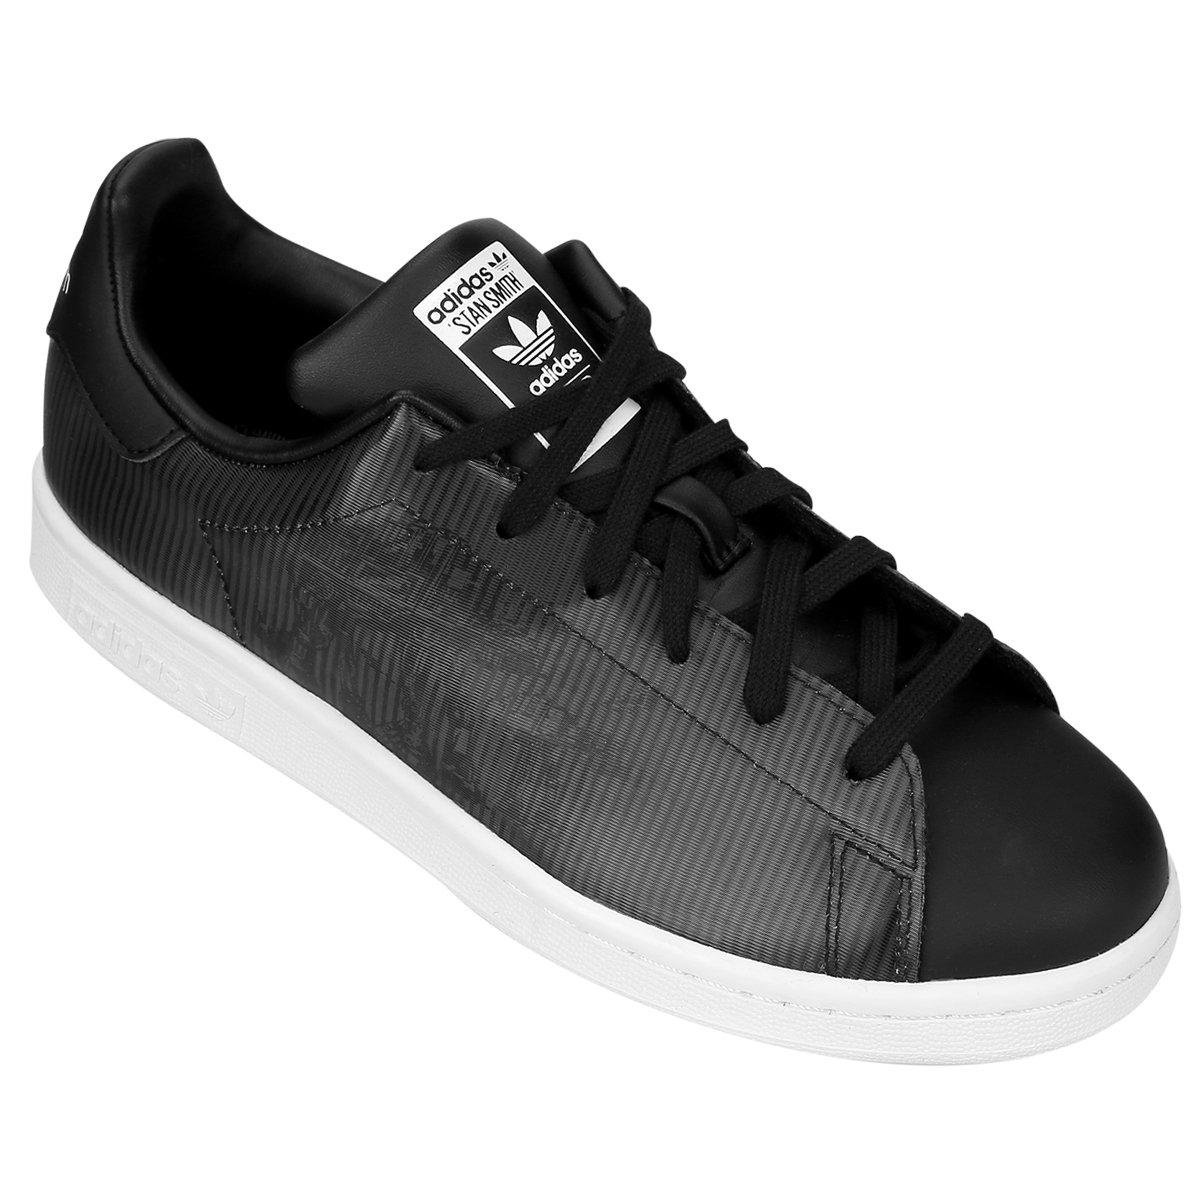 Tênis Adidas Stan Smith Atat Sw Infantil - Compre Agora  47ebaa4bc25c4